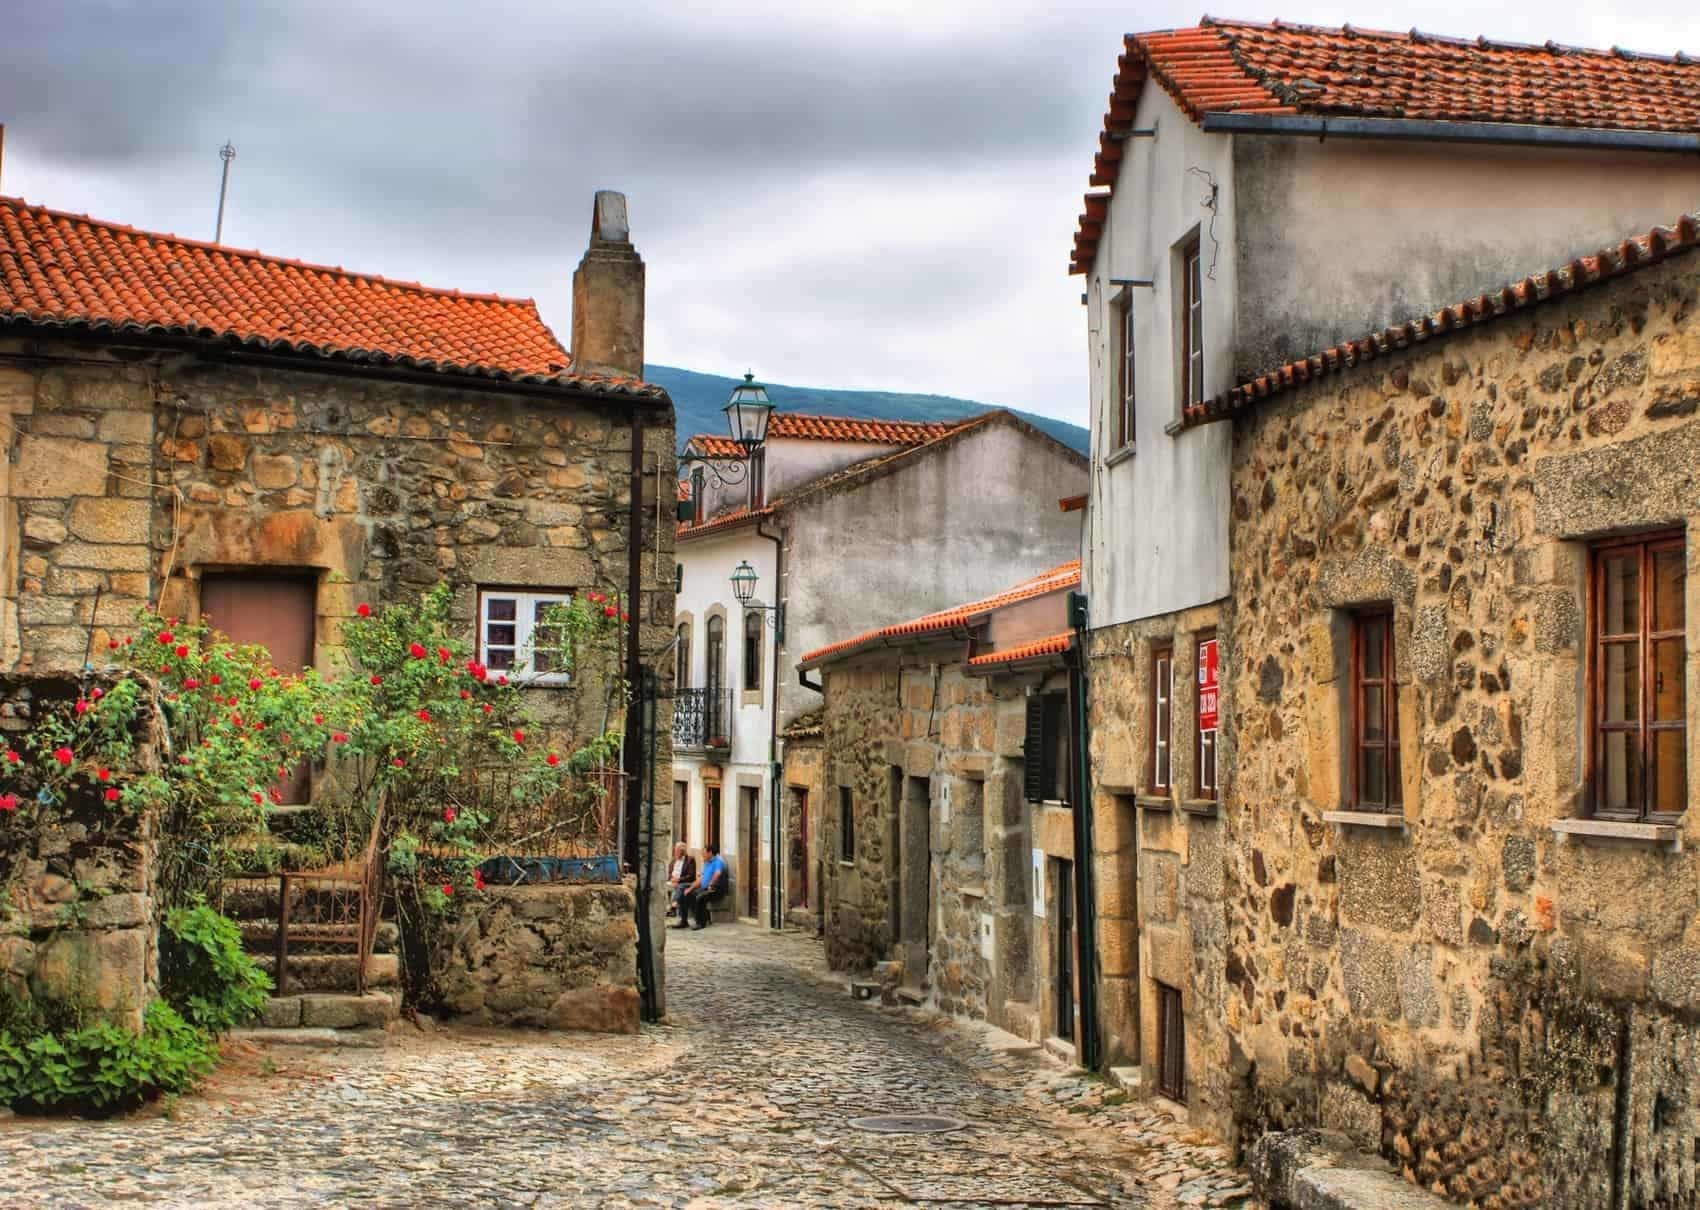 Old rural village of Linhares da Beira, Portugal